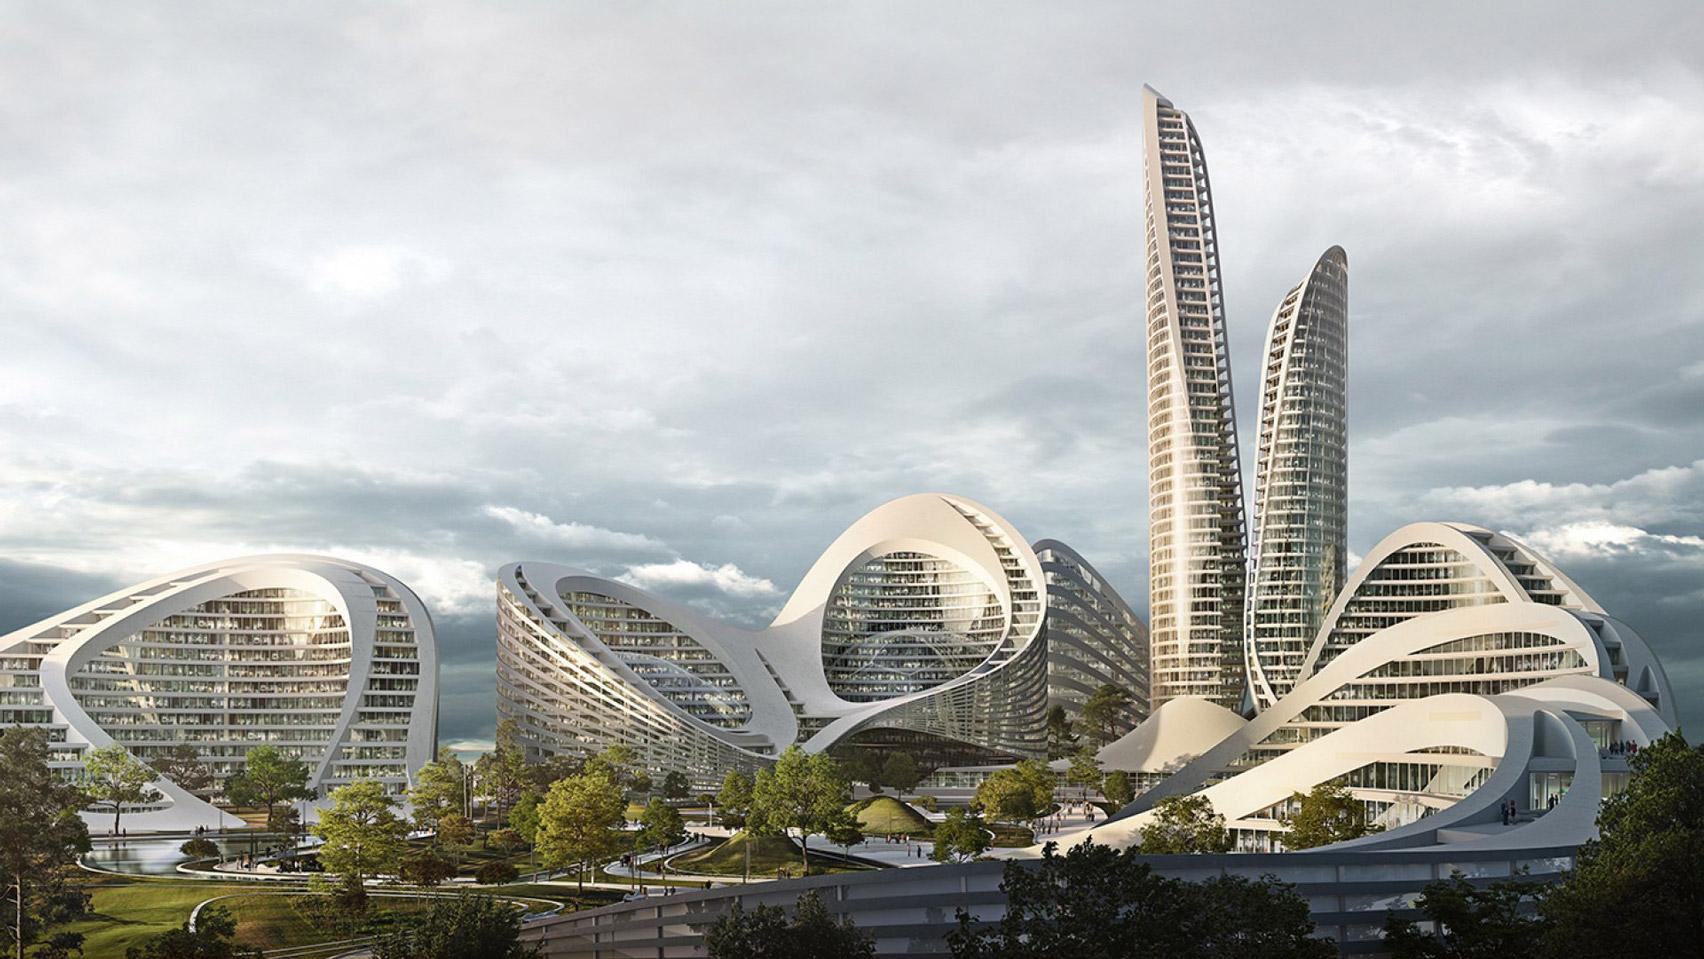 Rublyovo-Arkhangelskoye,Moscow smart city by Zaha Hadid Architects